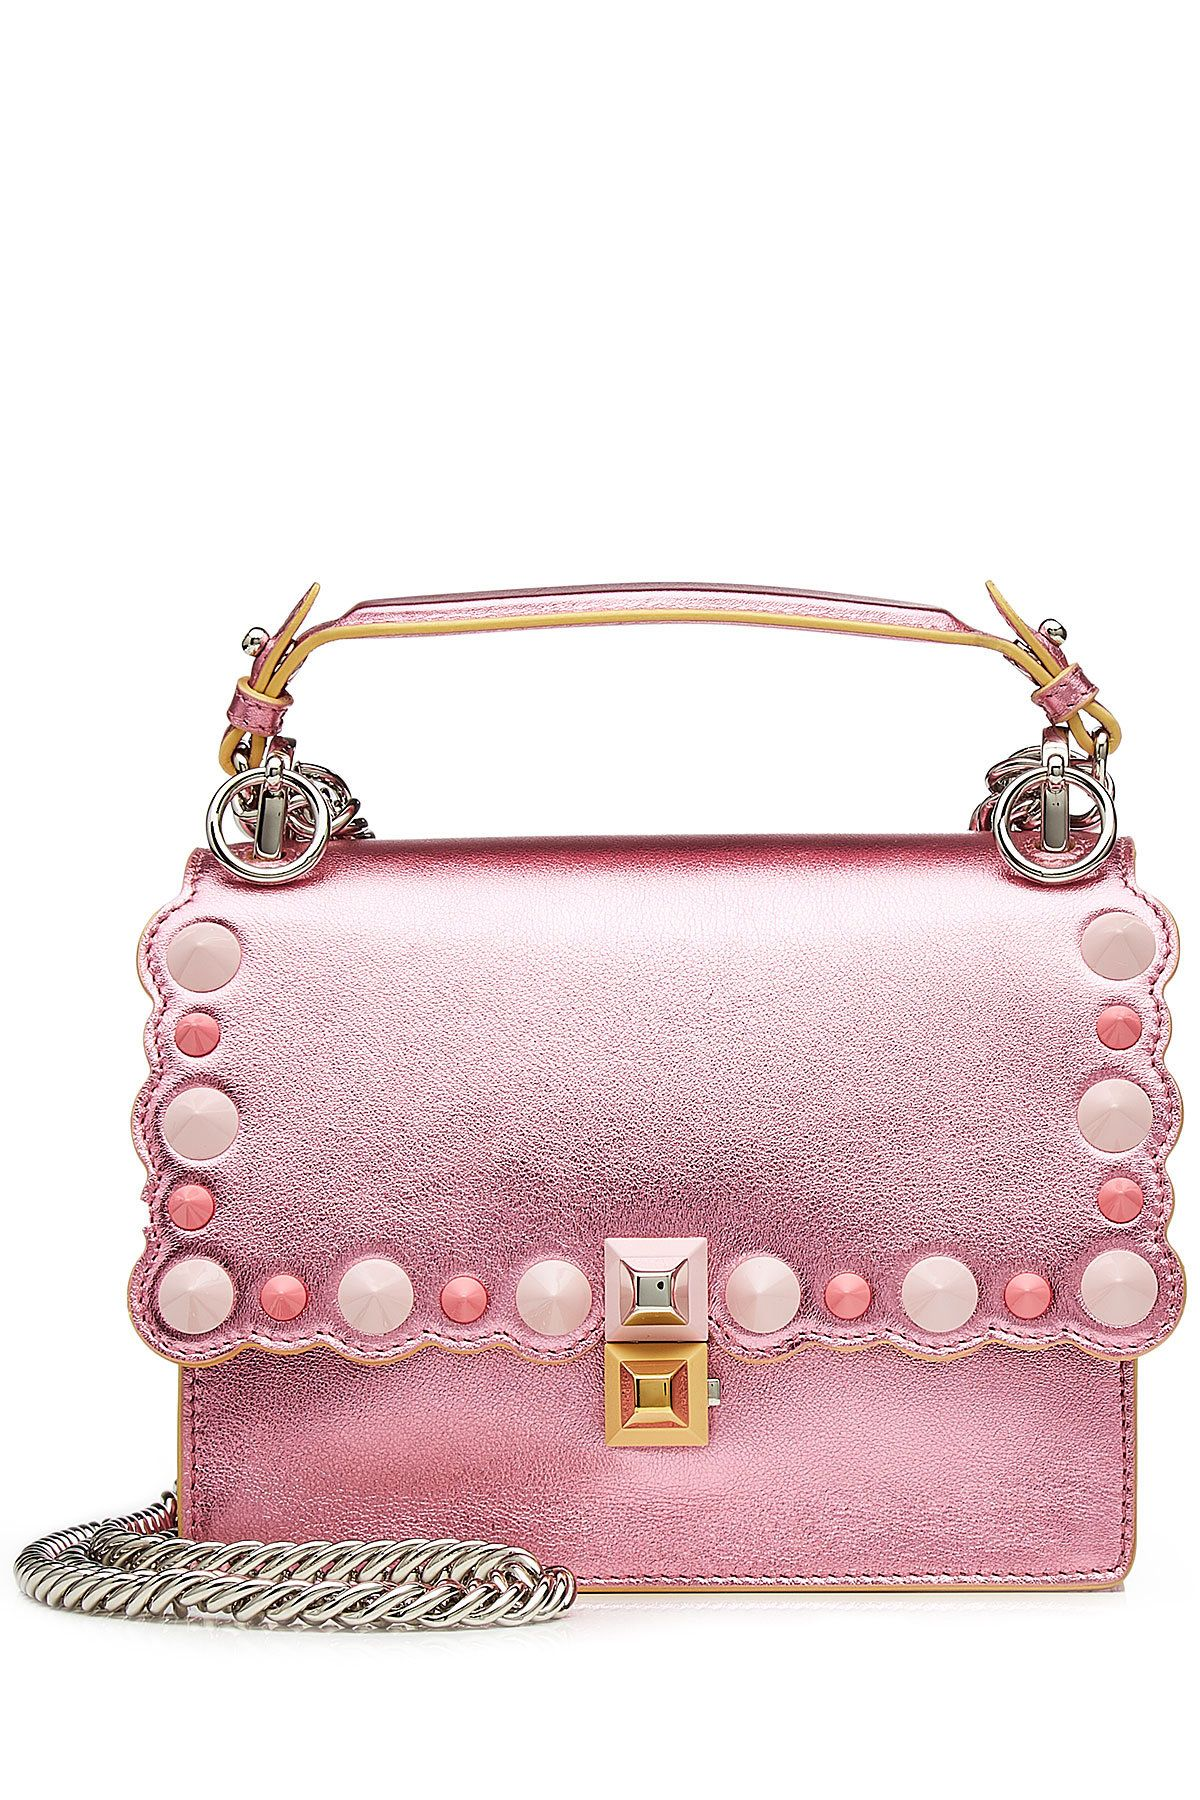 1b86667597 Fendi - Mini Kan I Metallic Leather Shoulder Bag